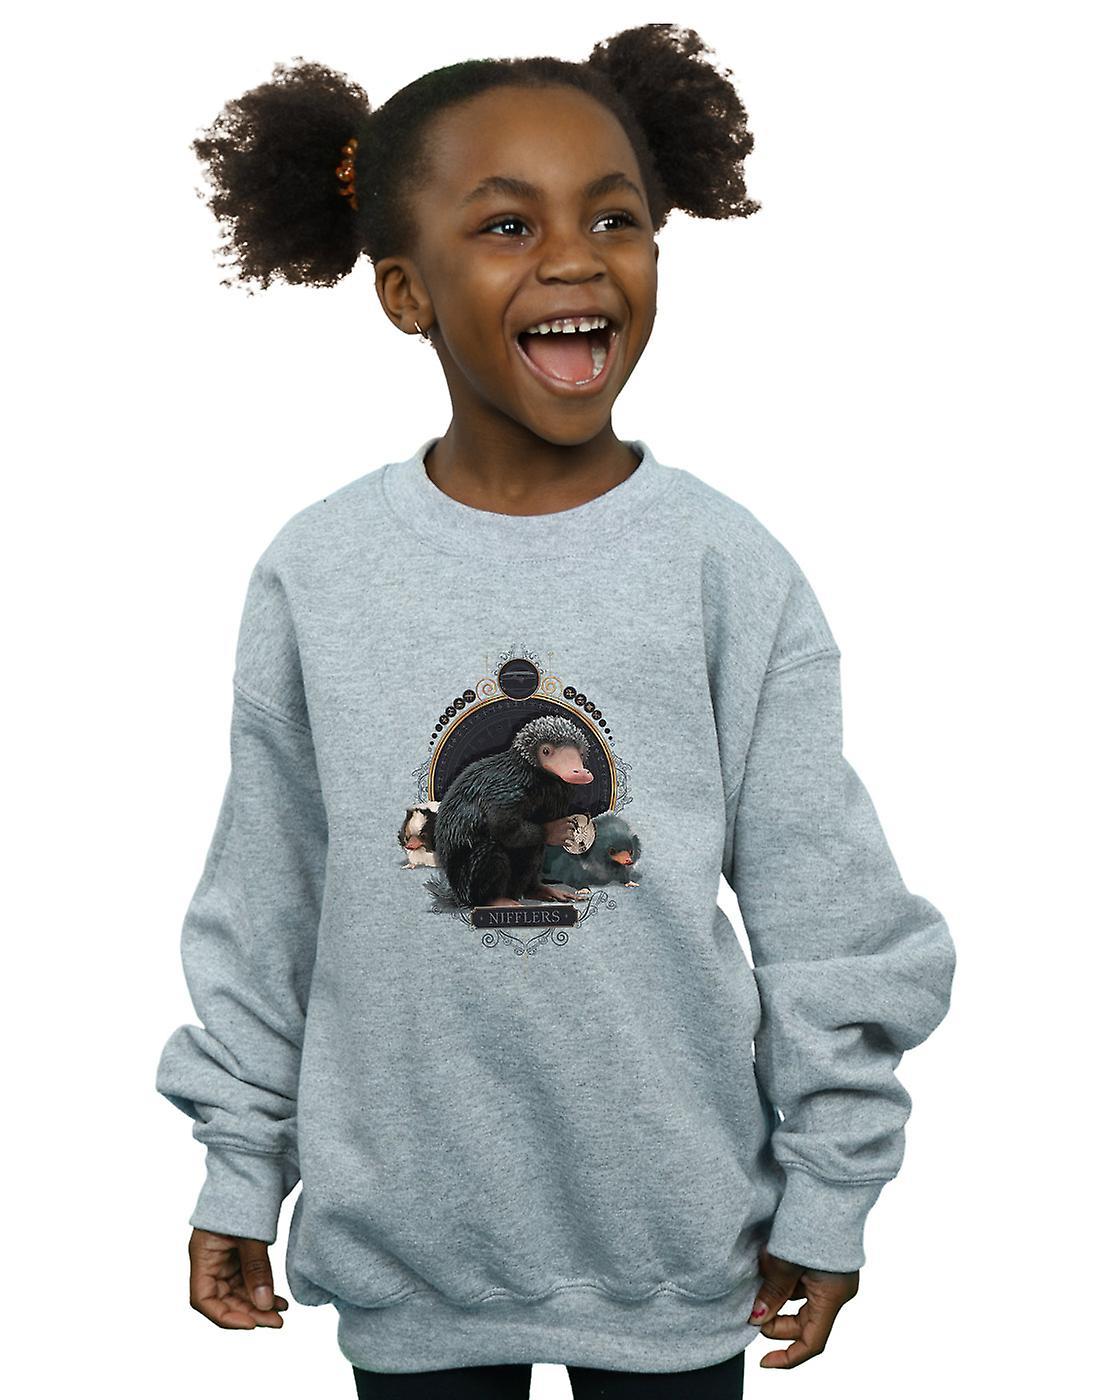 Fantastic Beasts Girls Baby Nifflers Sweatshirt